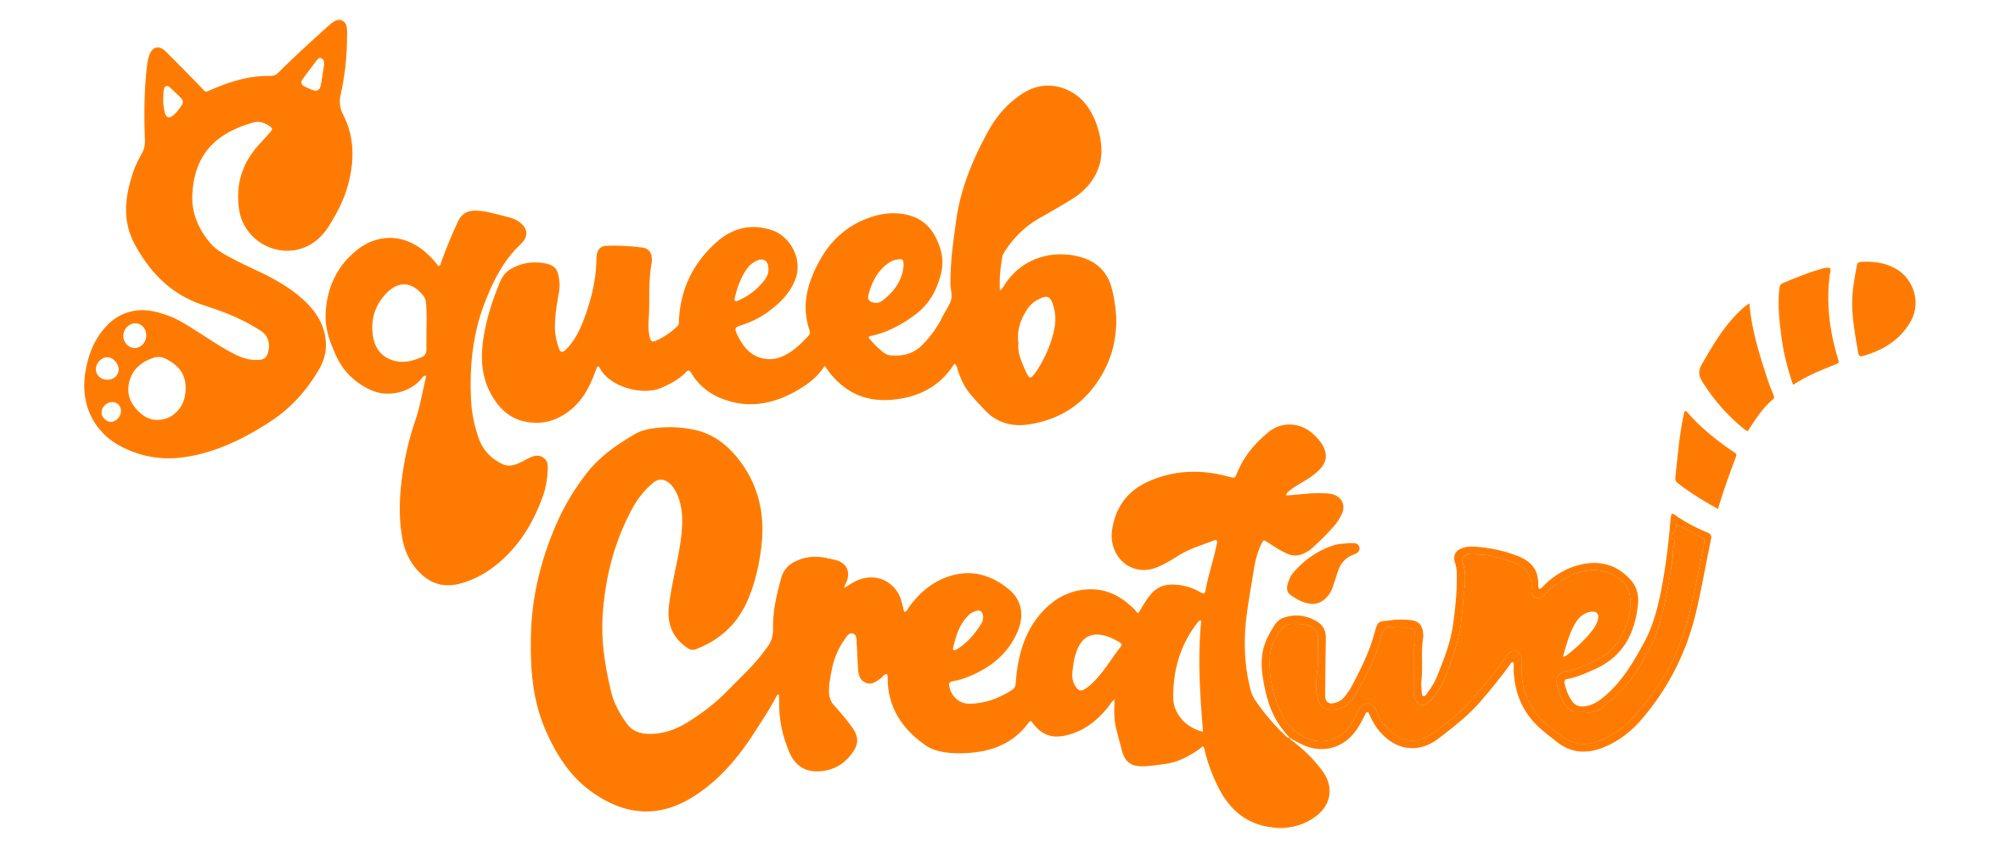 Squeeb Creative